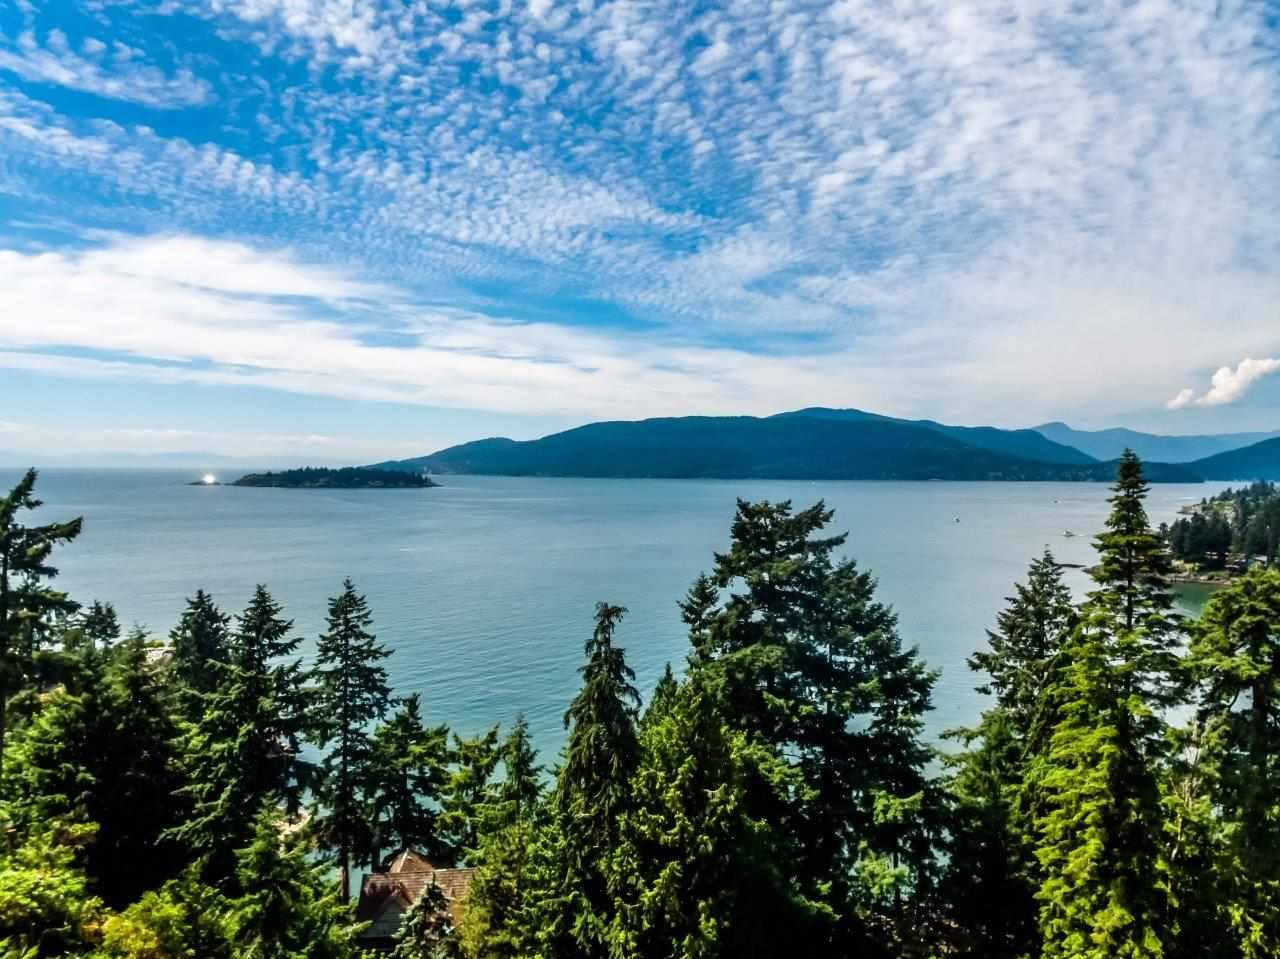 5380 MARINE DRIVE, West Vancouver, BC, V7W 2P8 Photo 1